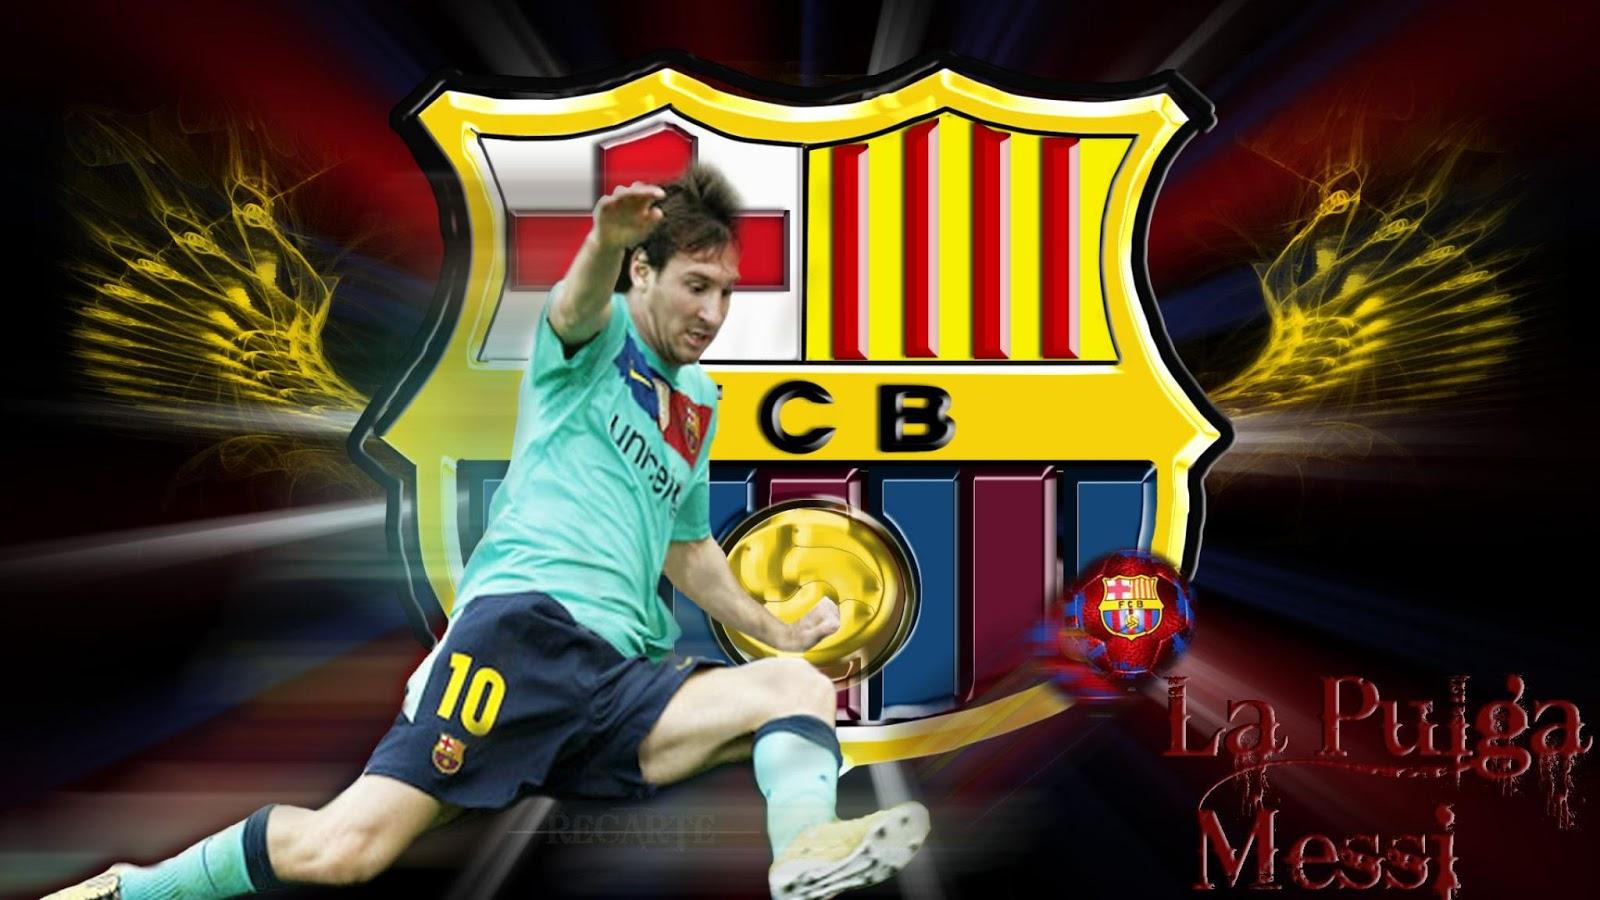 Lionel Messi Hd Desktop Wallpapers 2048x1152 Wallpaper Hd 2015